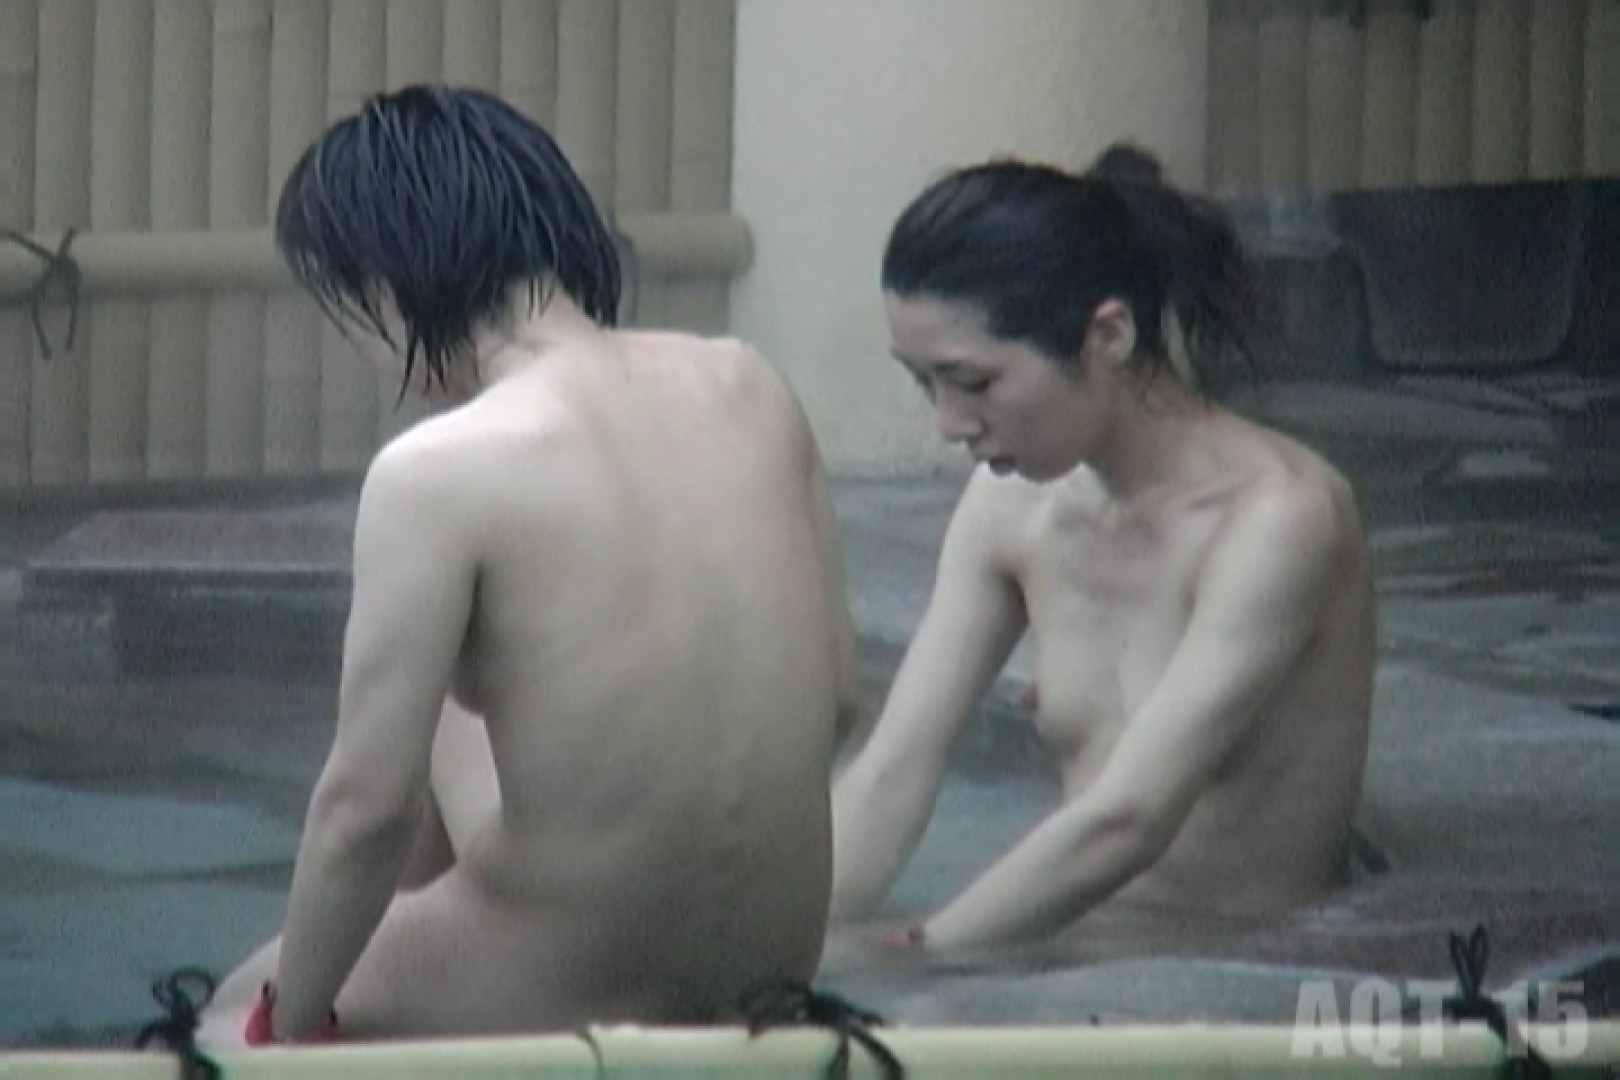 Aquaな露天風呂Vol.837 盗撮映像  107Pix 7